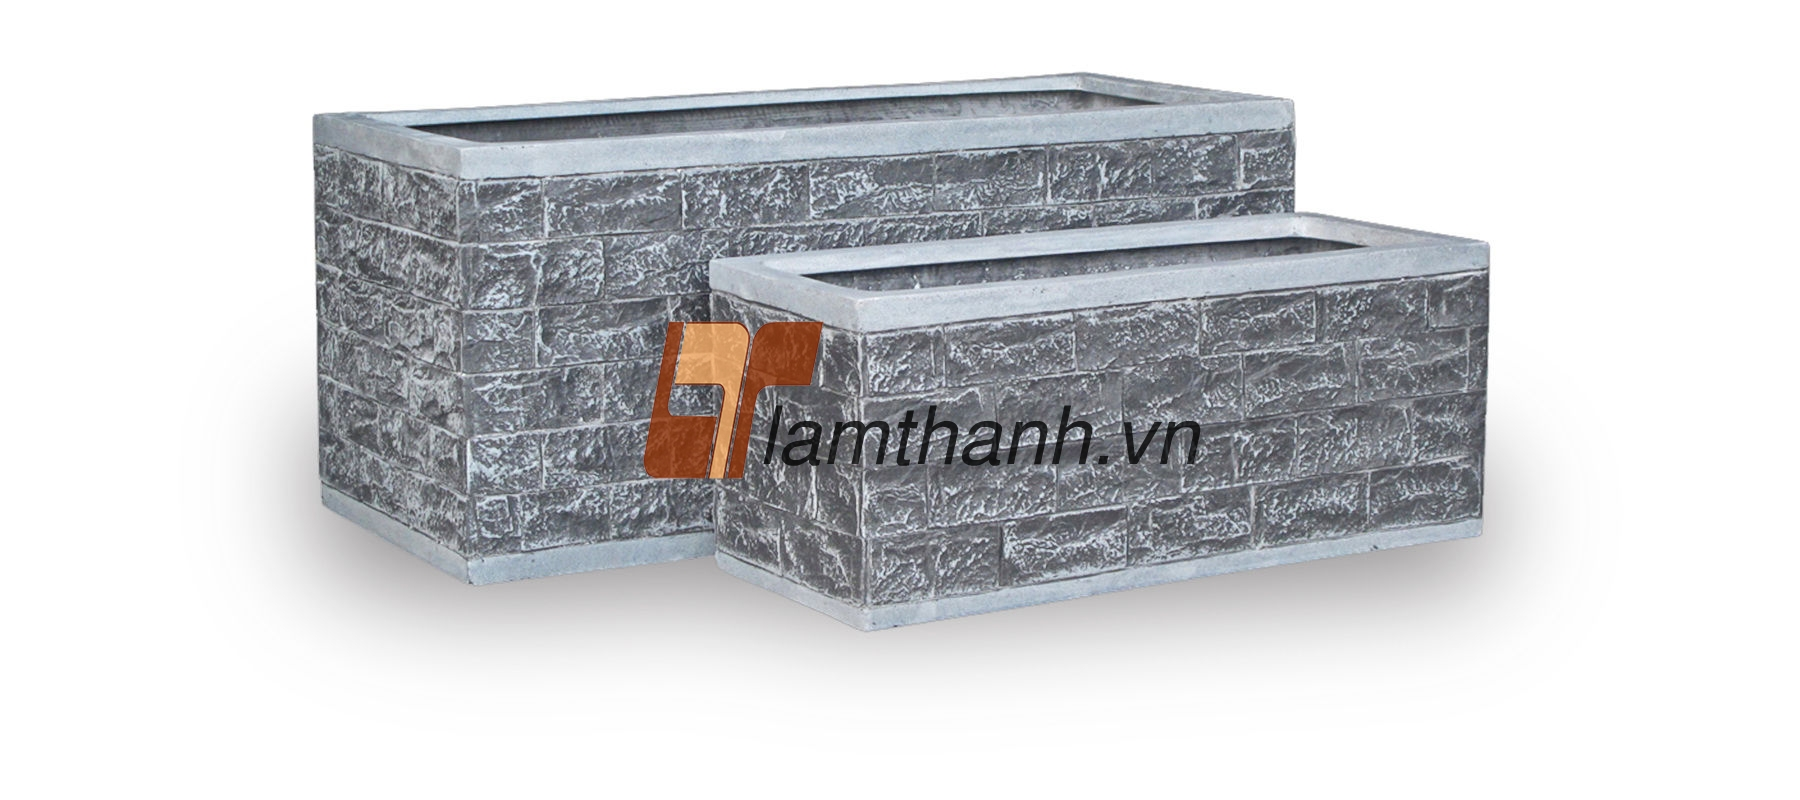 vietnam polystone, outdoor glazed 01